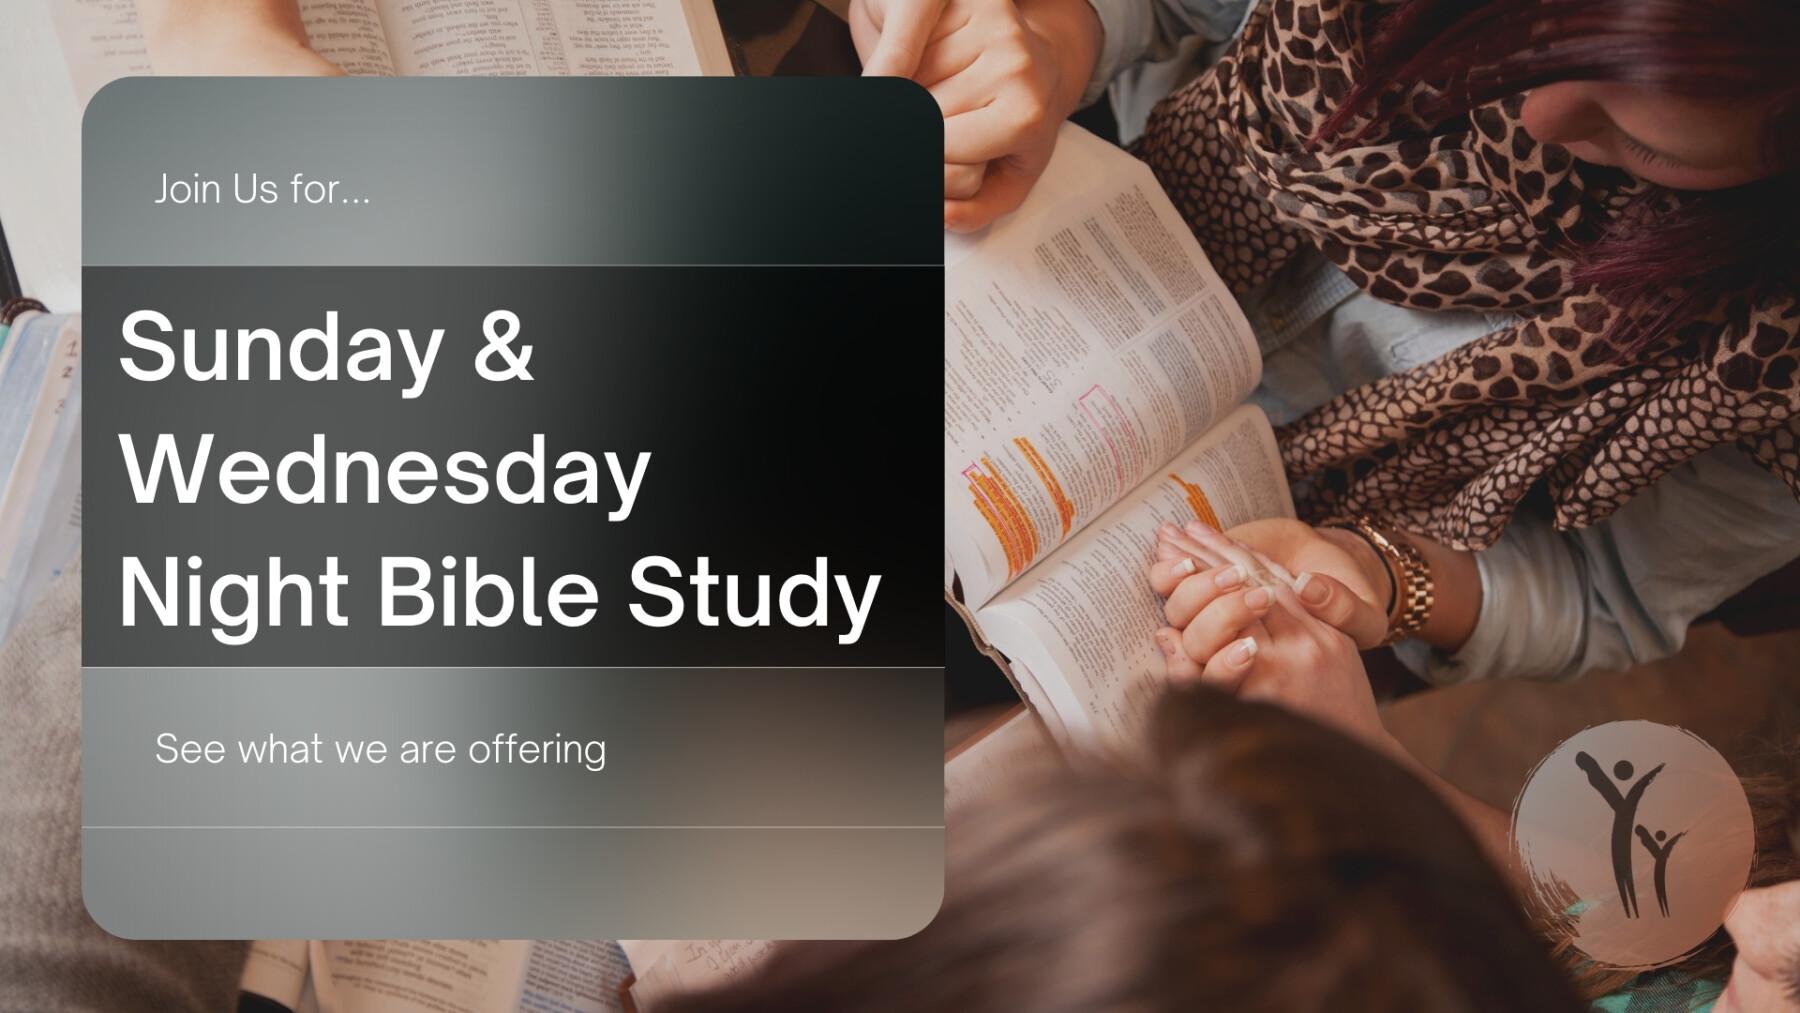 Sunday & Wednesday Night Bible Studies